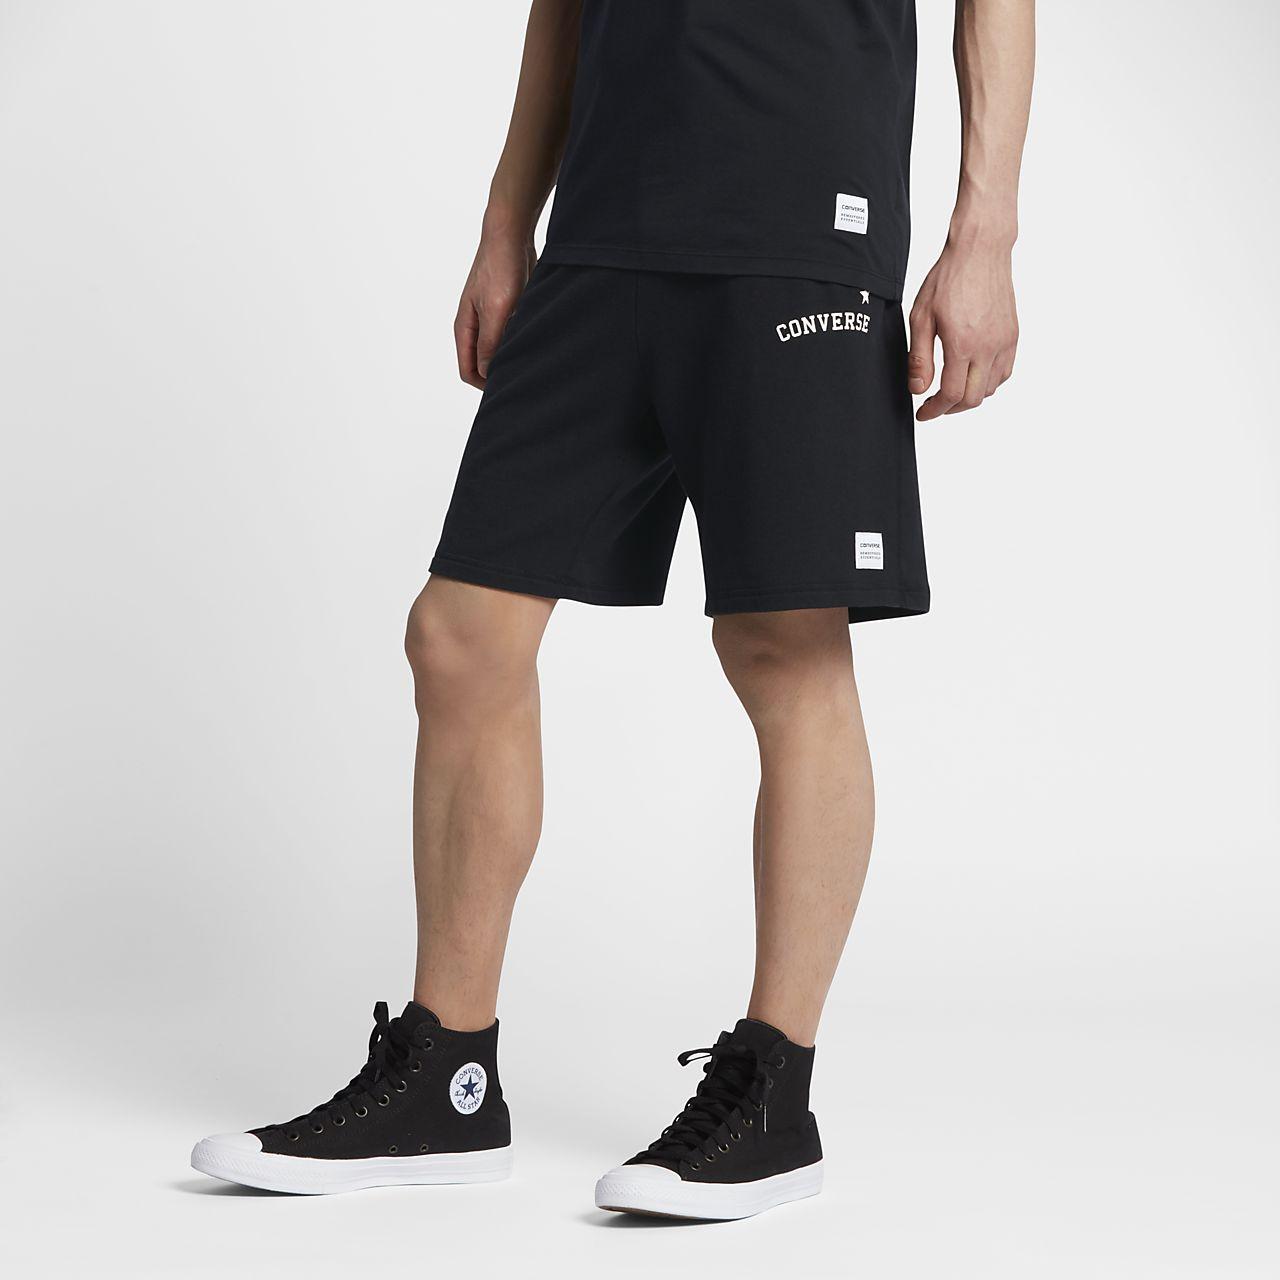 cheap converse shorts